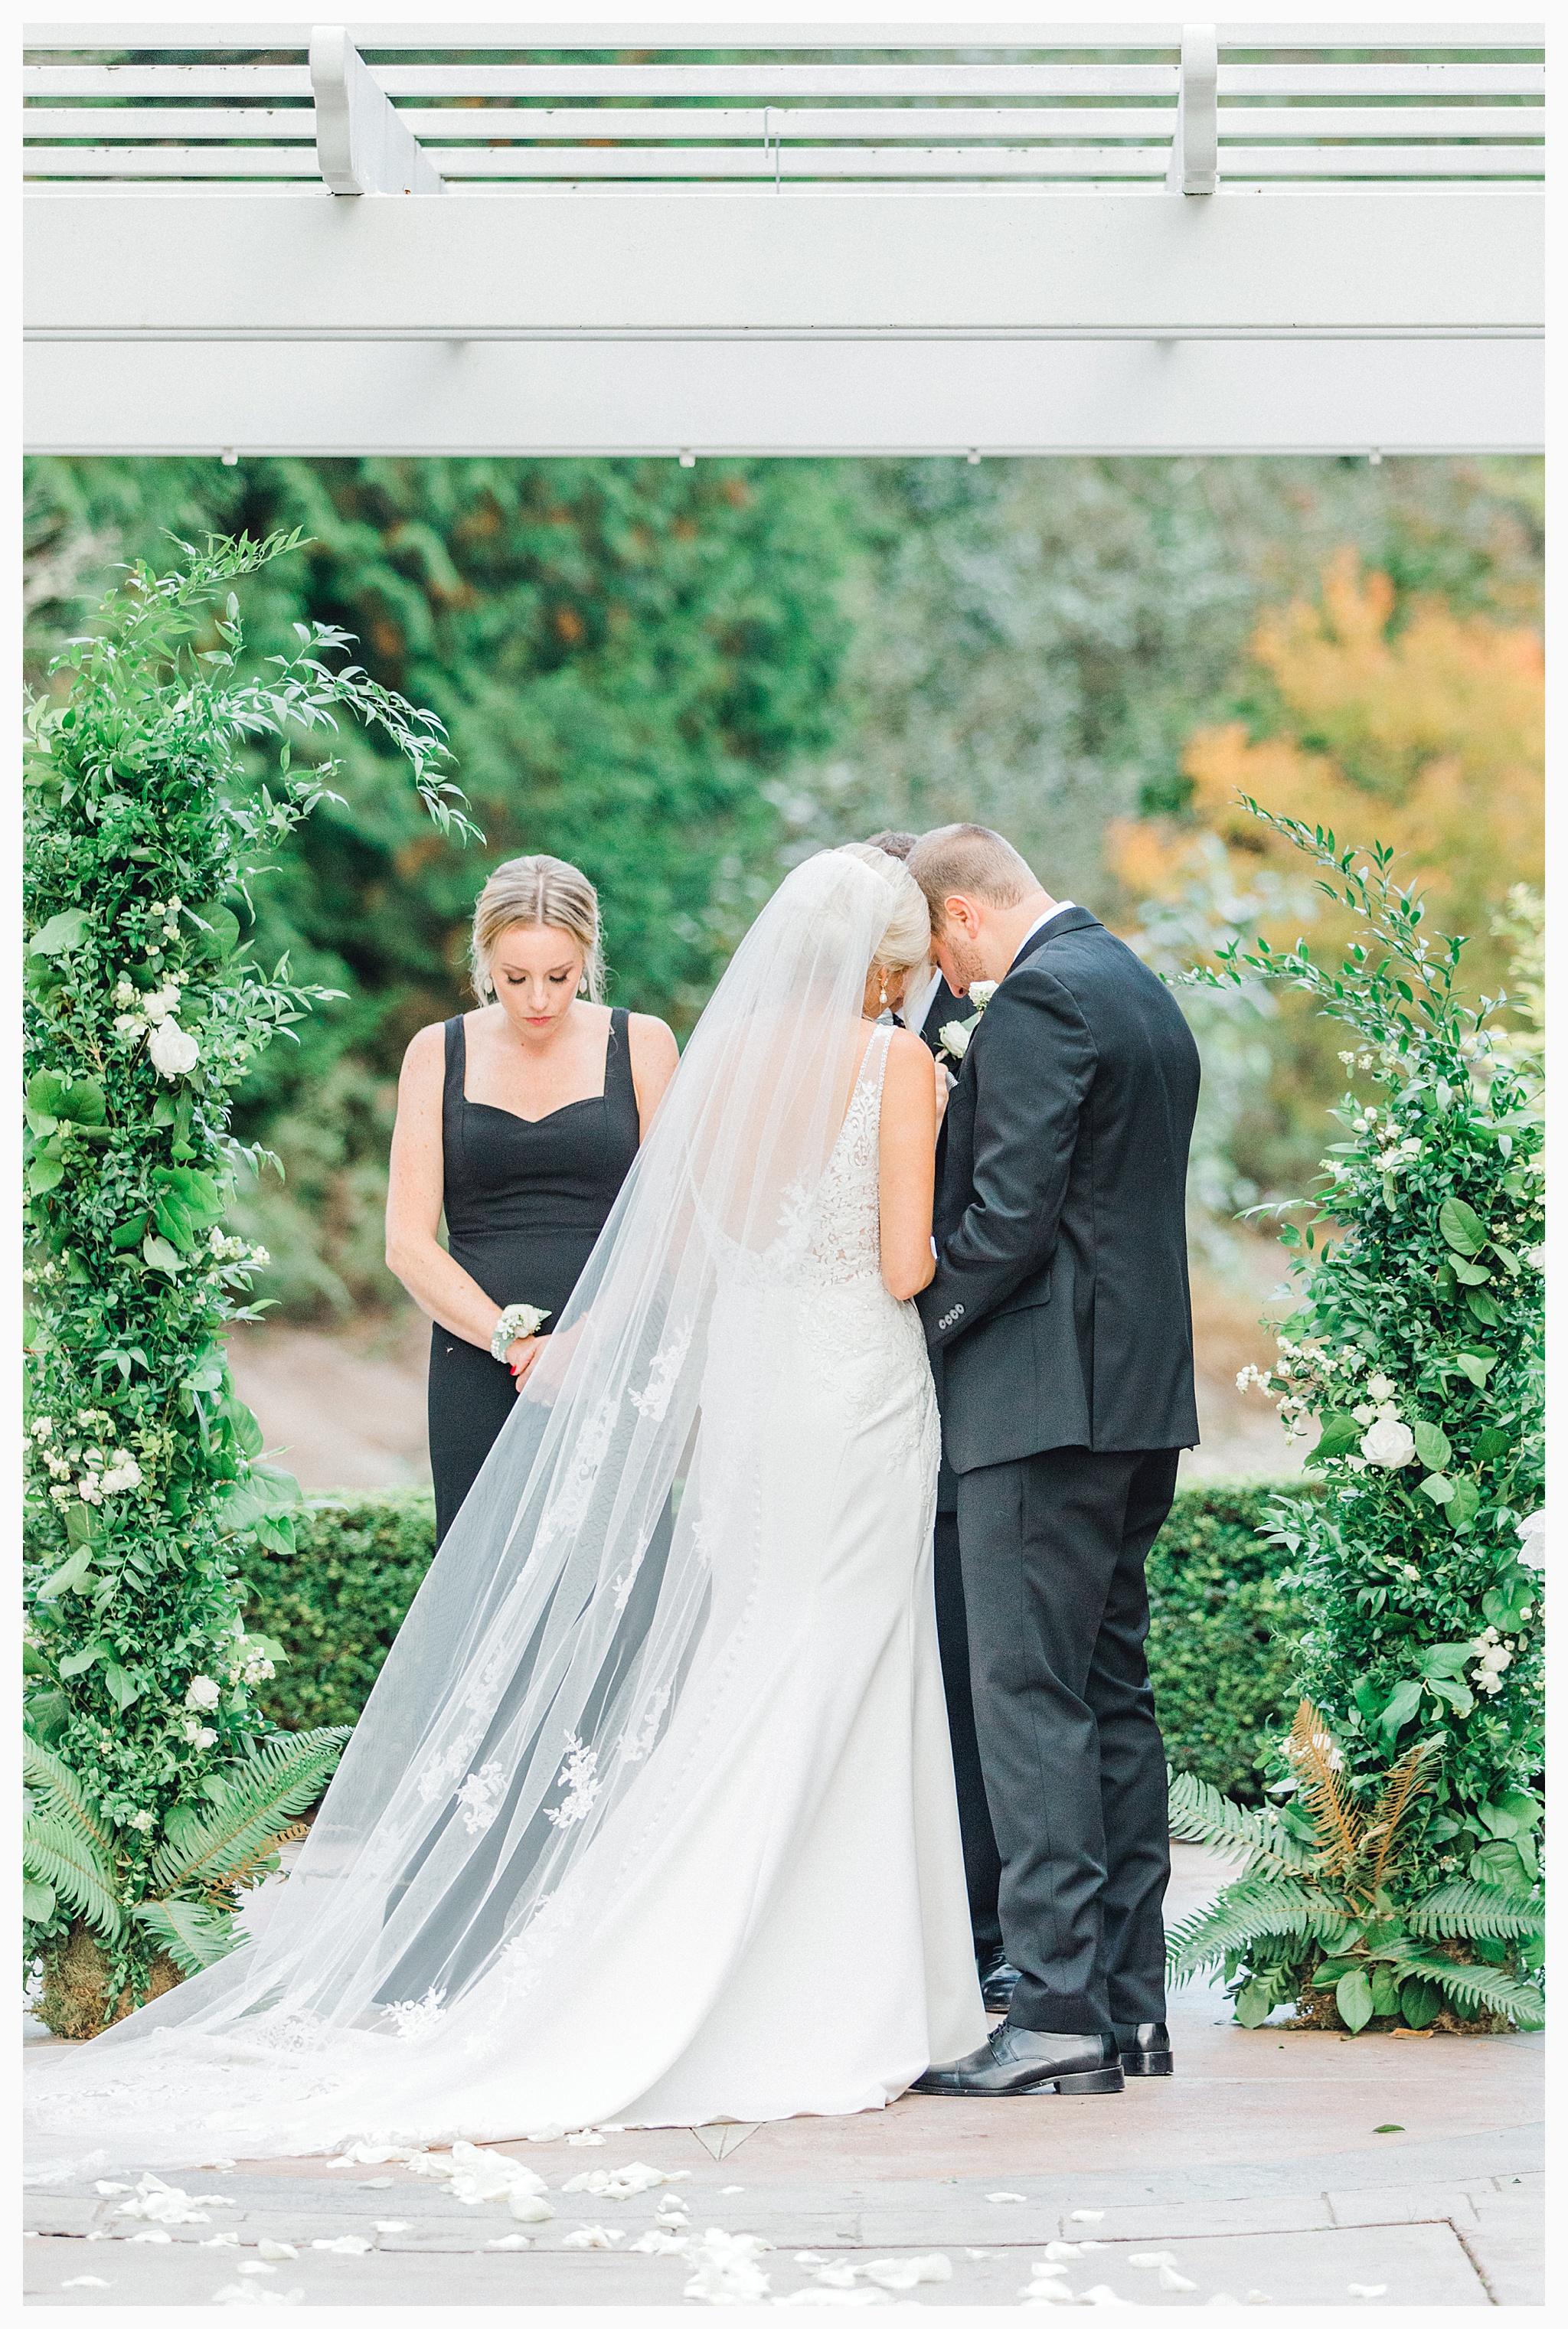 Emma Rose Company Light and Airy Wedding Photographer, Beautiful fall wedding at Rock Creek Gardens Venue in Puyallup, Washington._0077.jpg